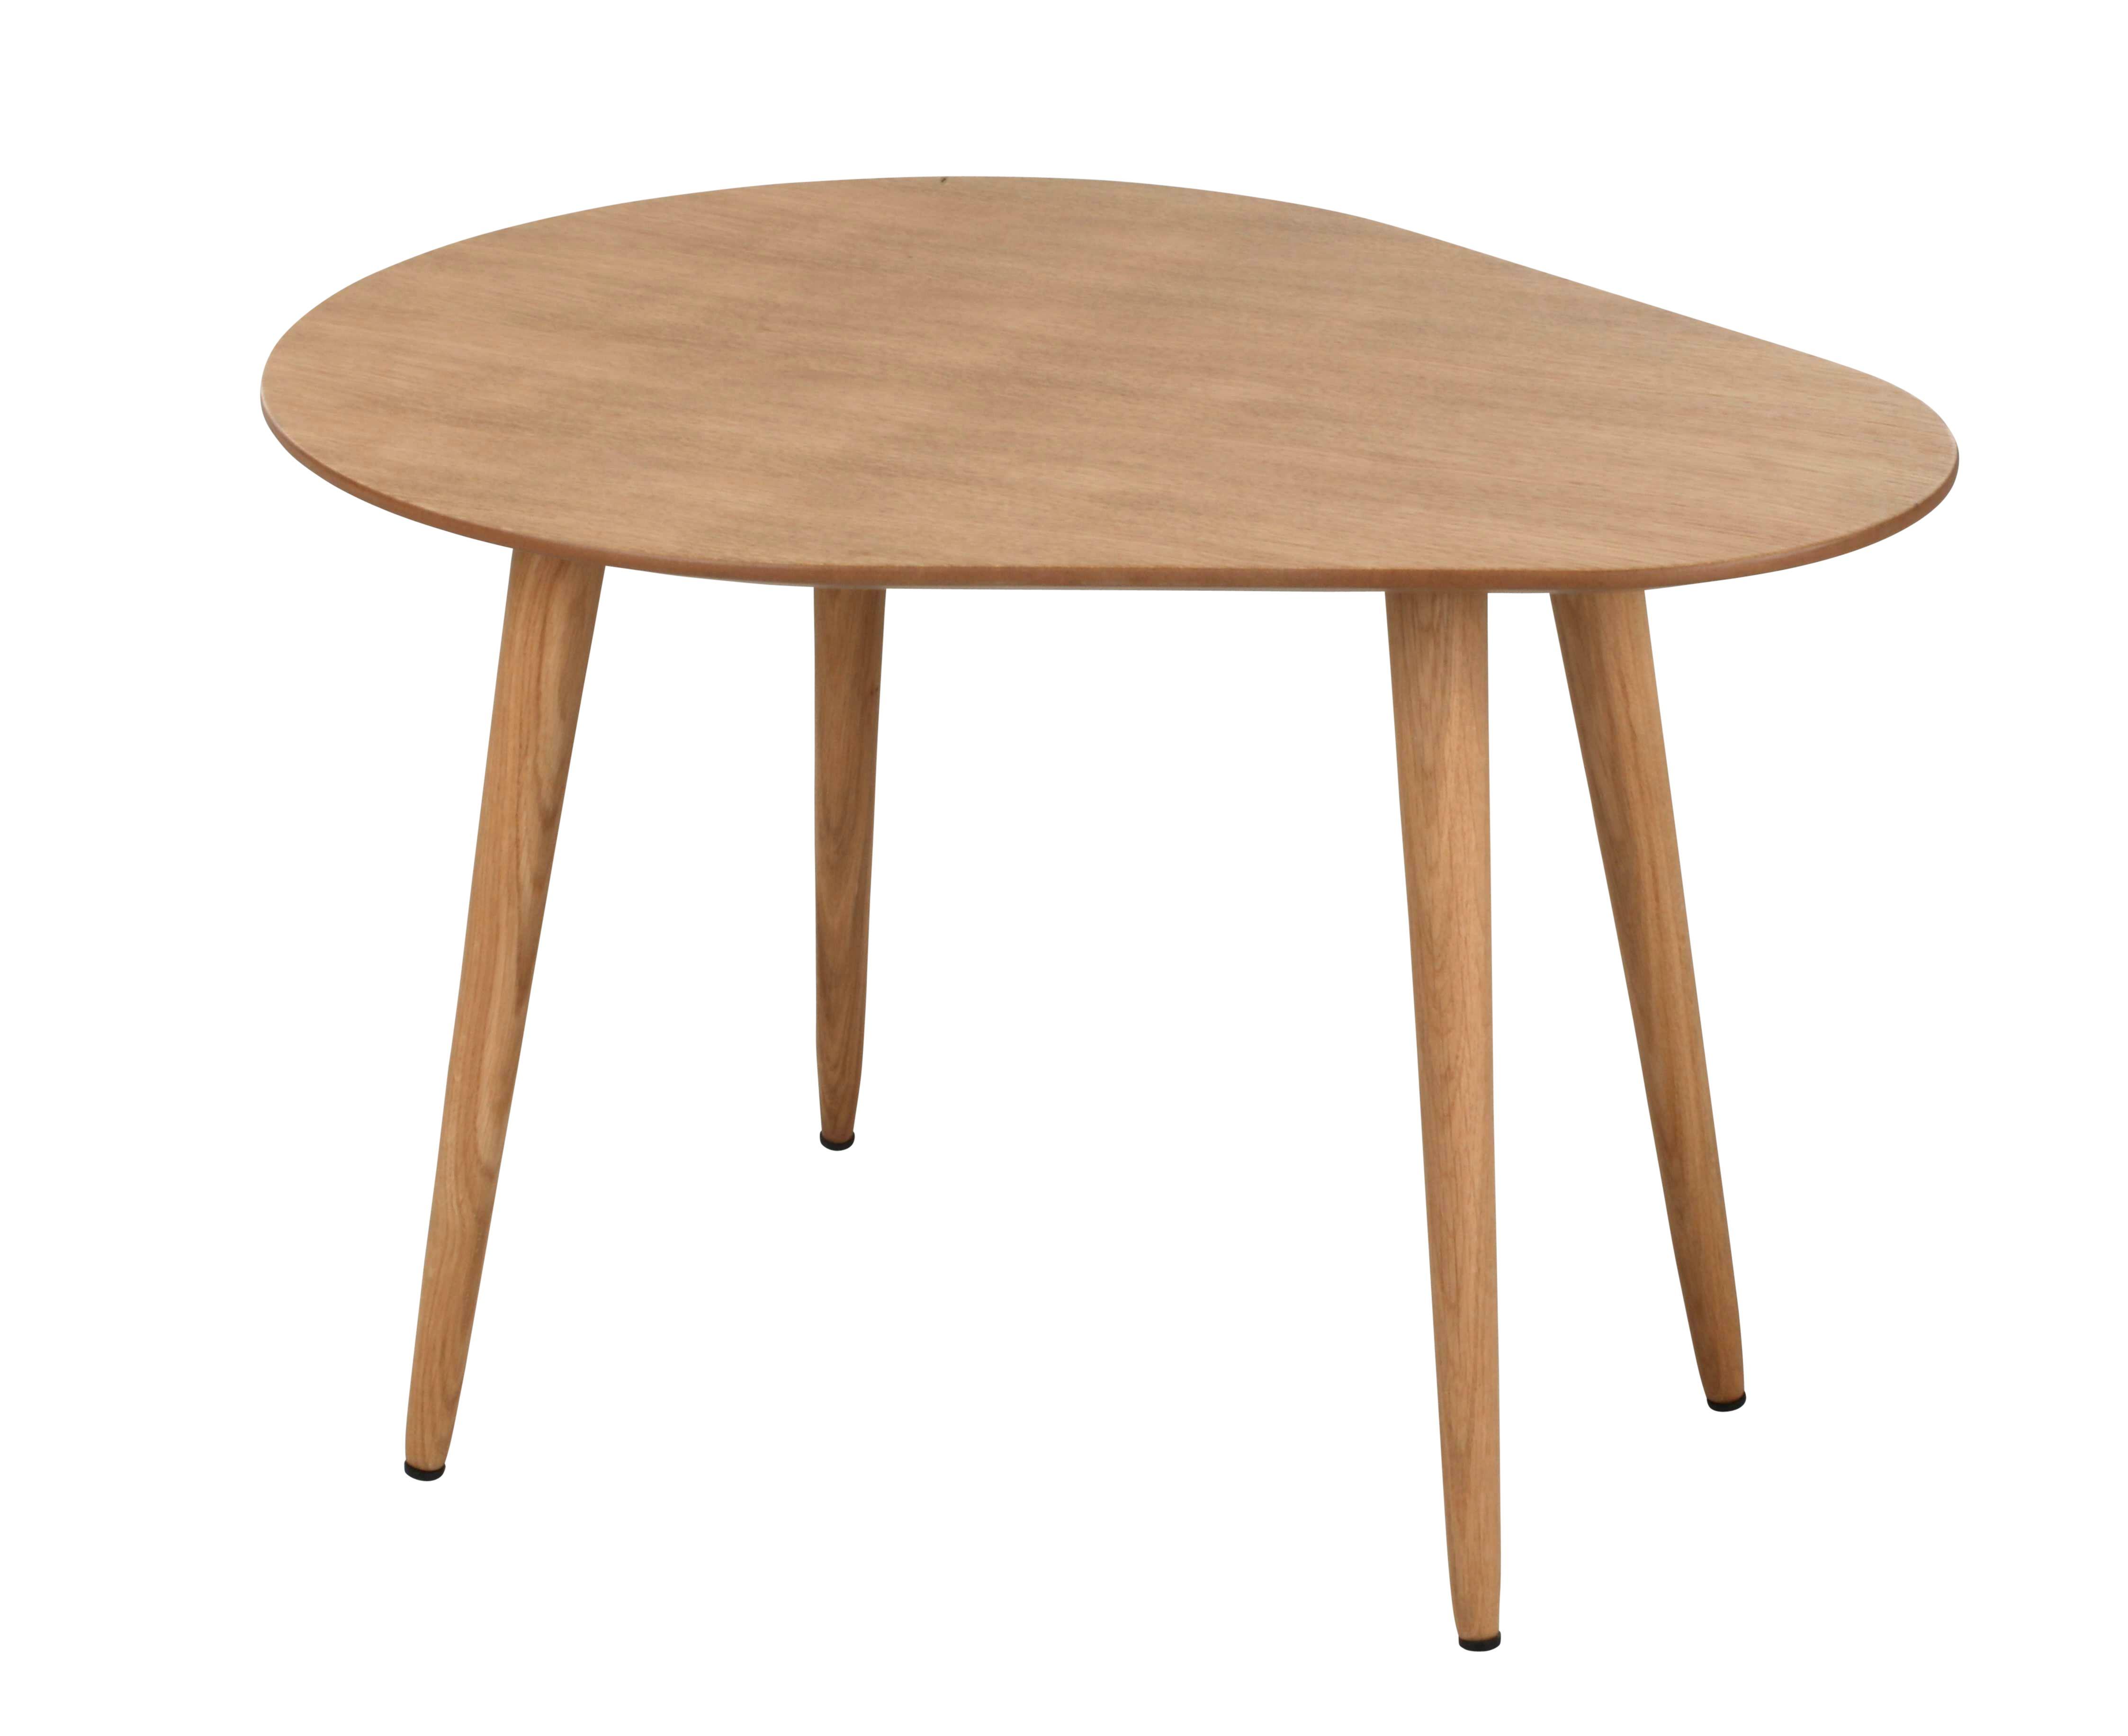 Table basse L 65 cm MANON Chªne